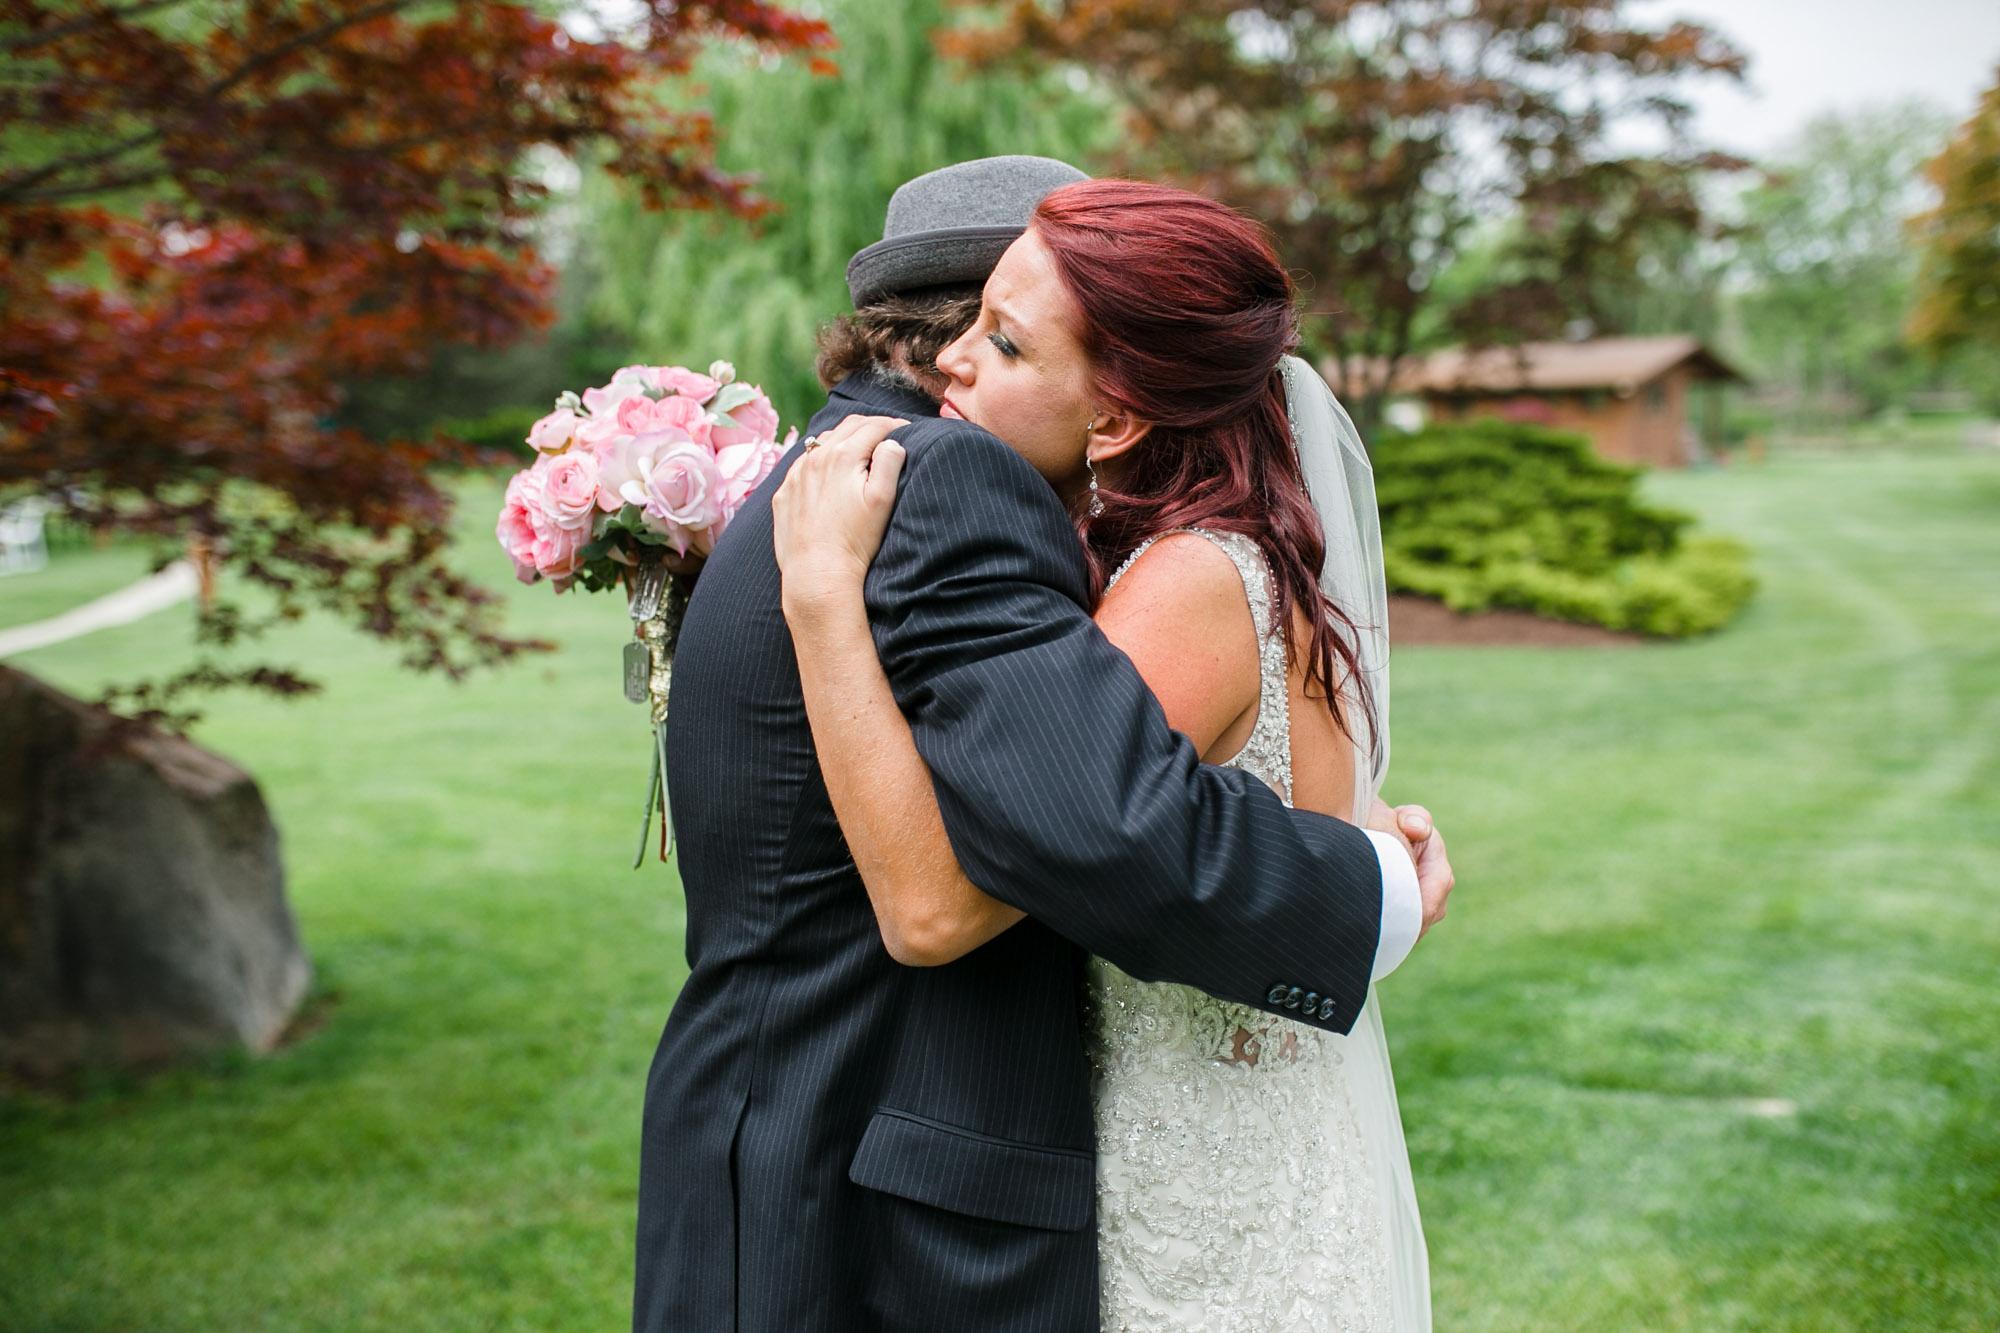 hensville-wedding-downtown-toledo-ohio (20 of 103).jpg